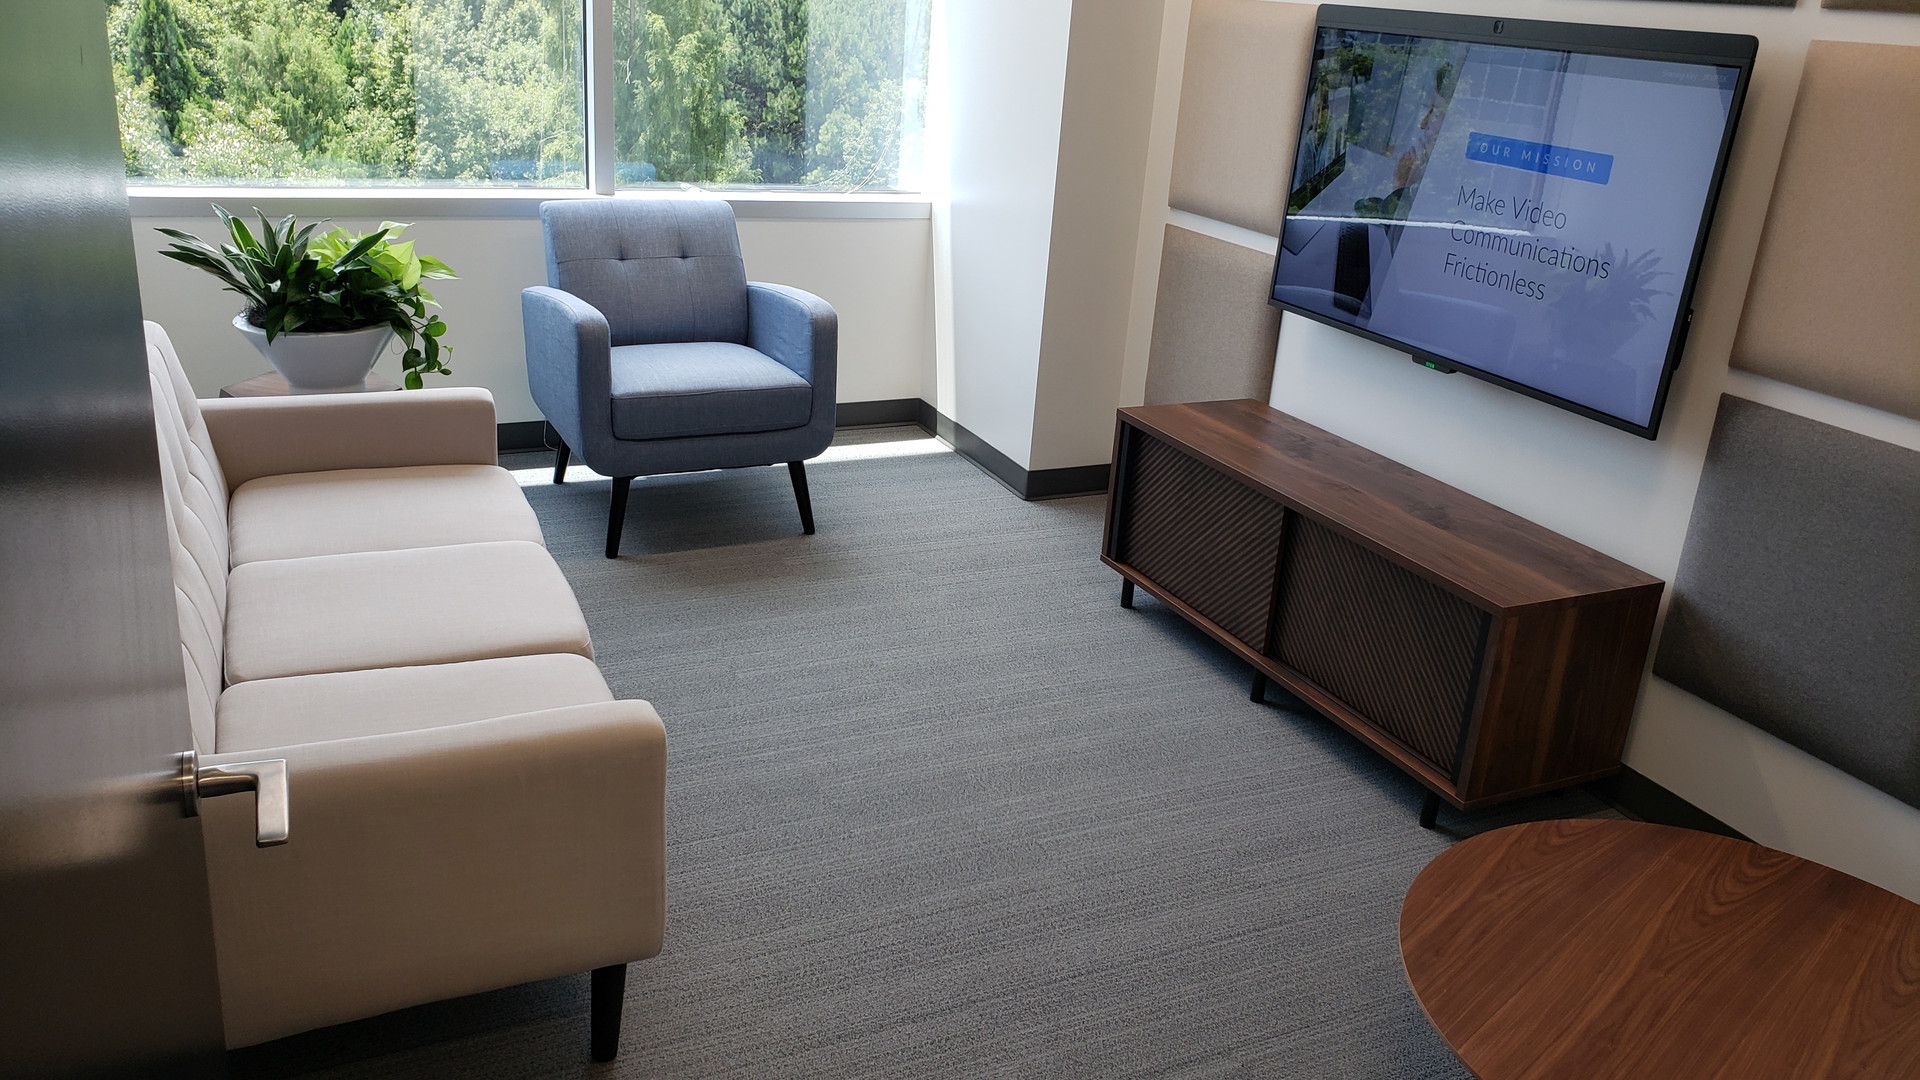 Skype Meeting Room - Buildout Pros